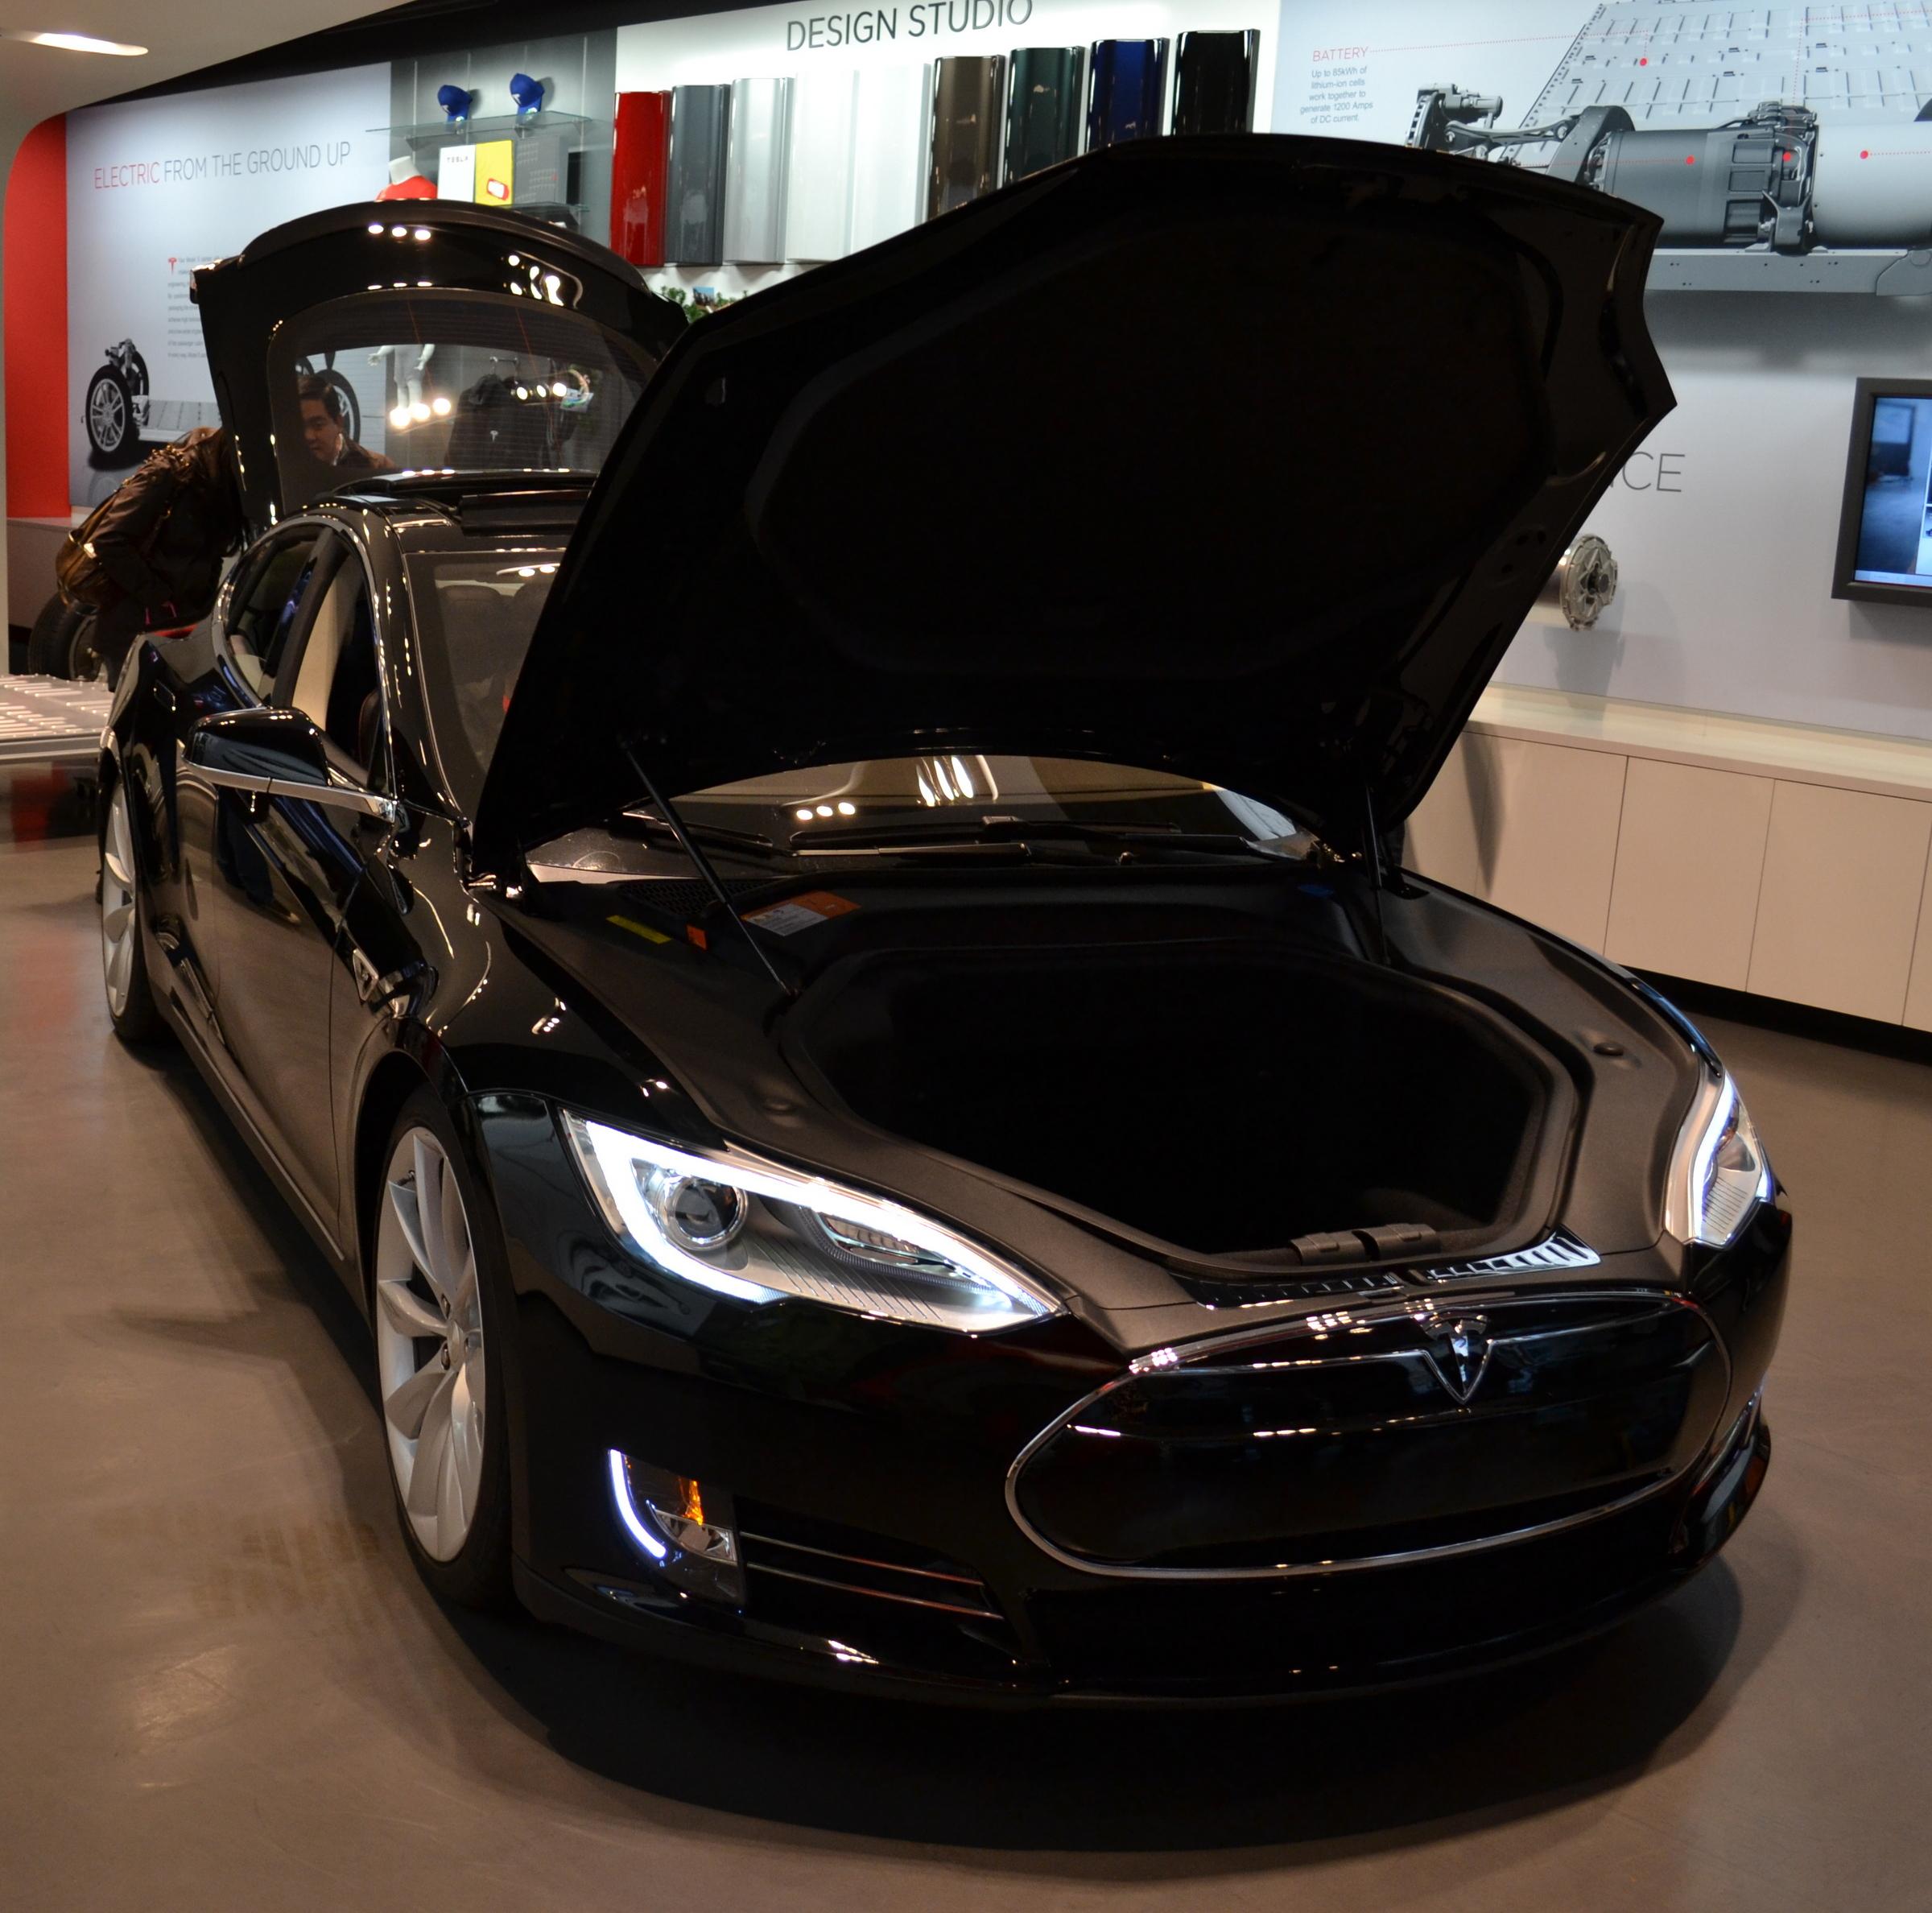 Tesla HD Wallpapers Hd Wallpapers 2400x2376